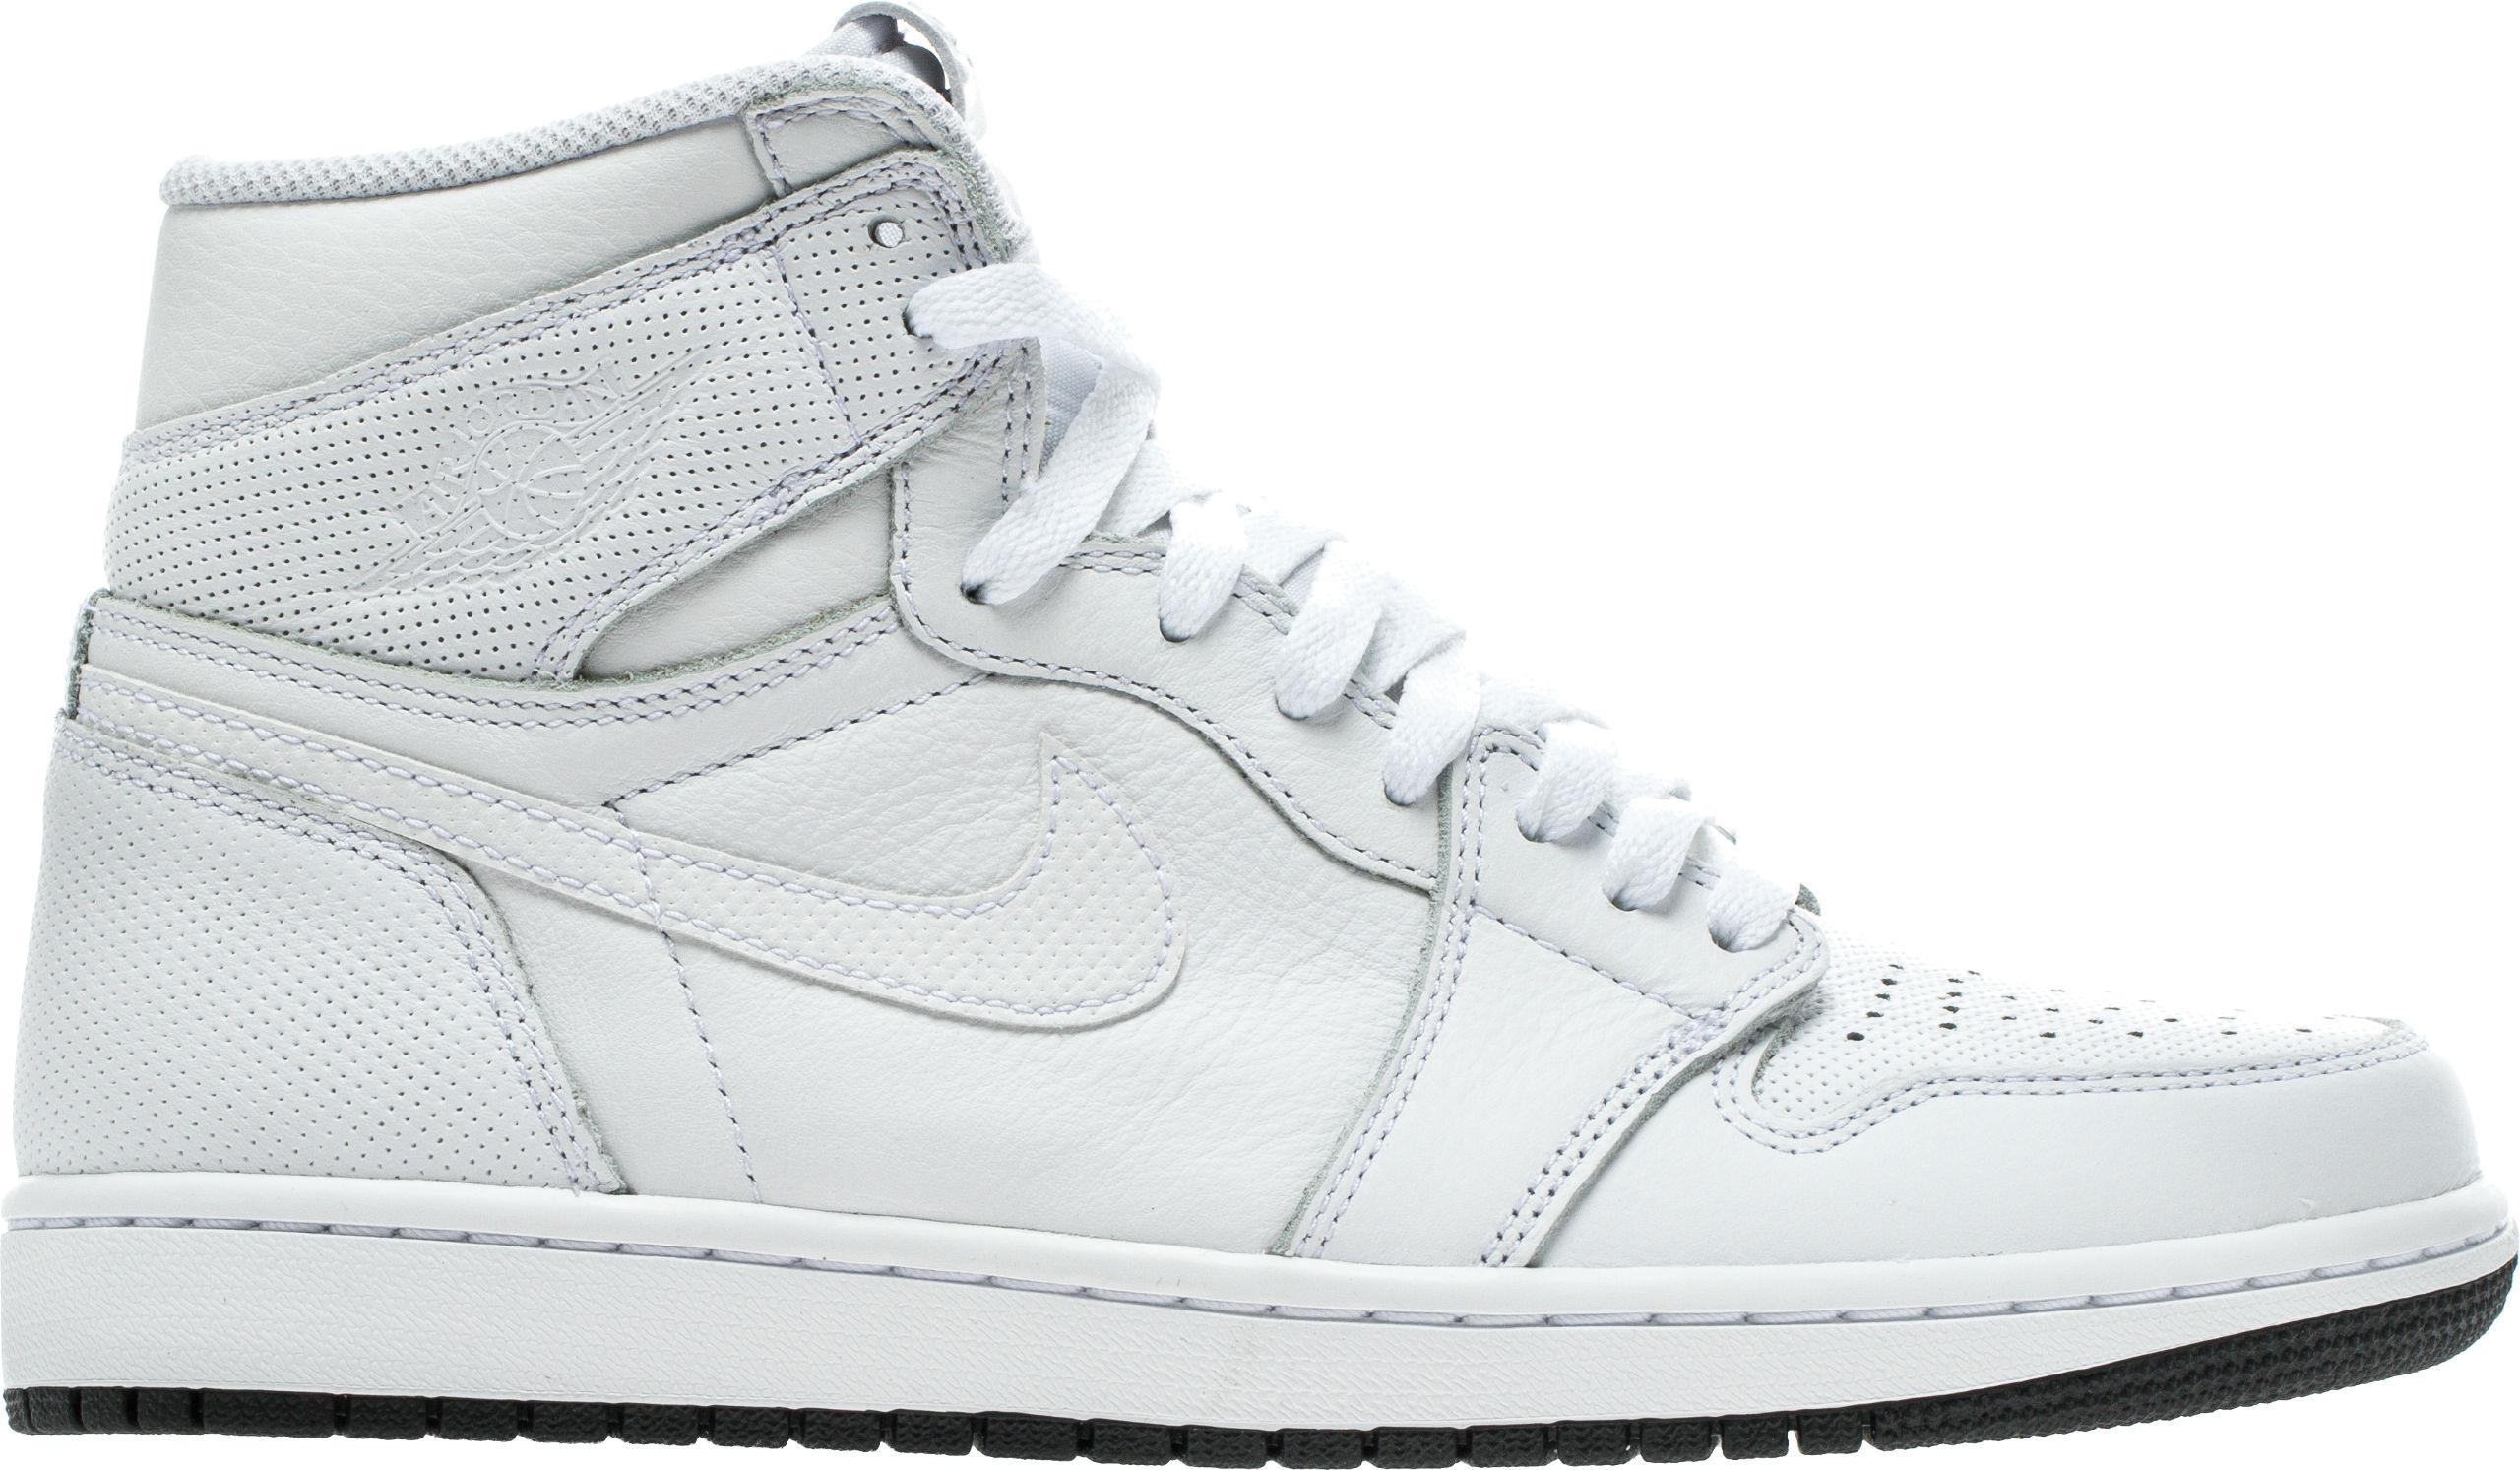 ffa559740a4c ... best price air jordan retro 1 og perforated pack hi mens lifestyle shoe.  59.98 fs